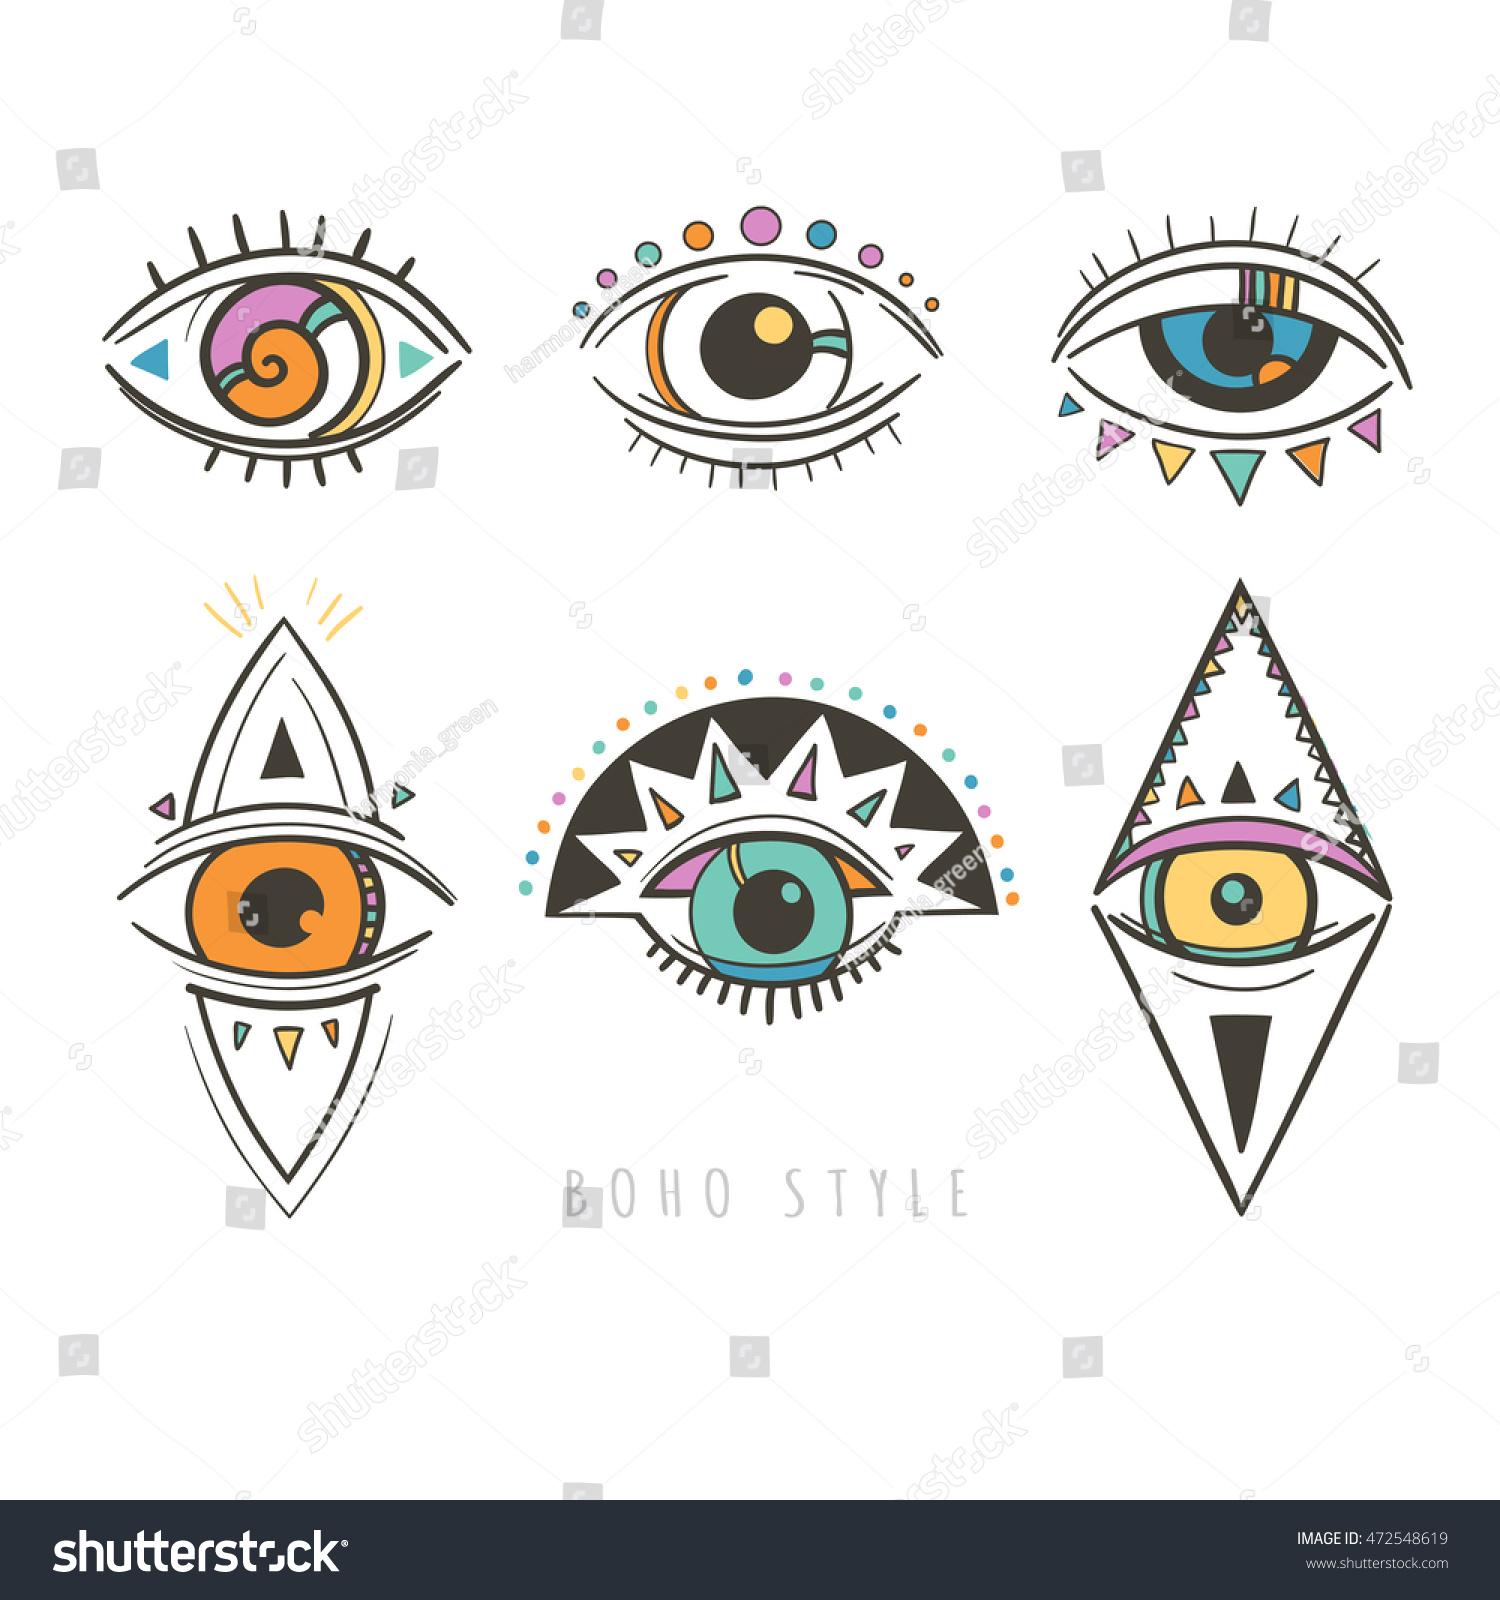 Royalty Free Hand Drawn Mystic Eyes Vector 472548619 Stock Photo